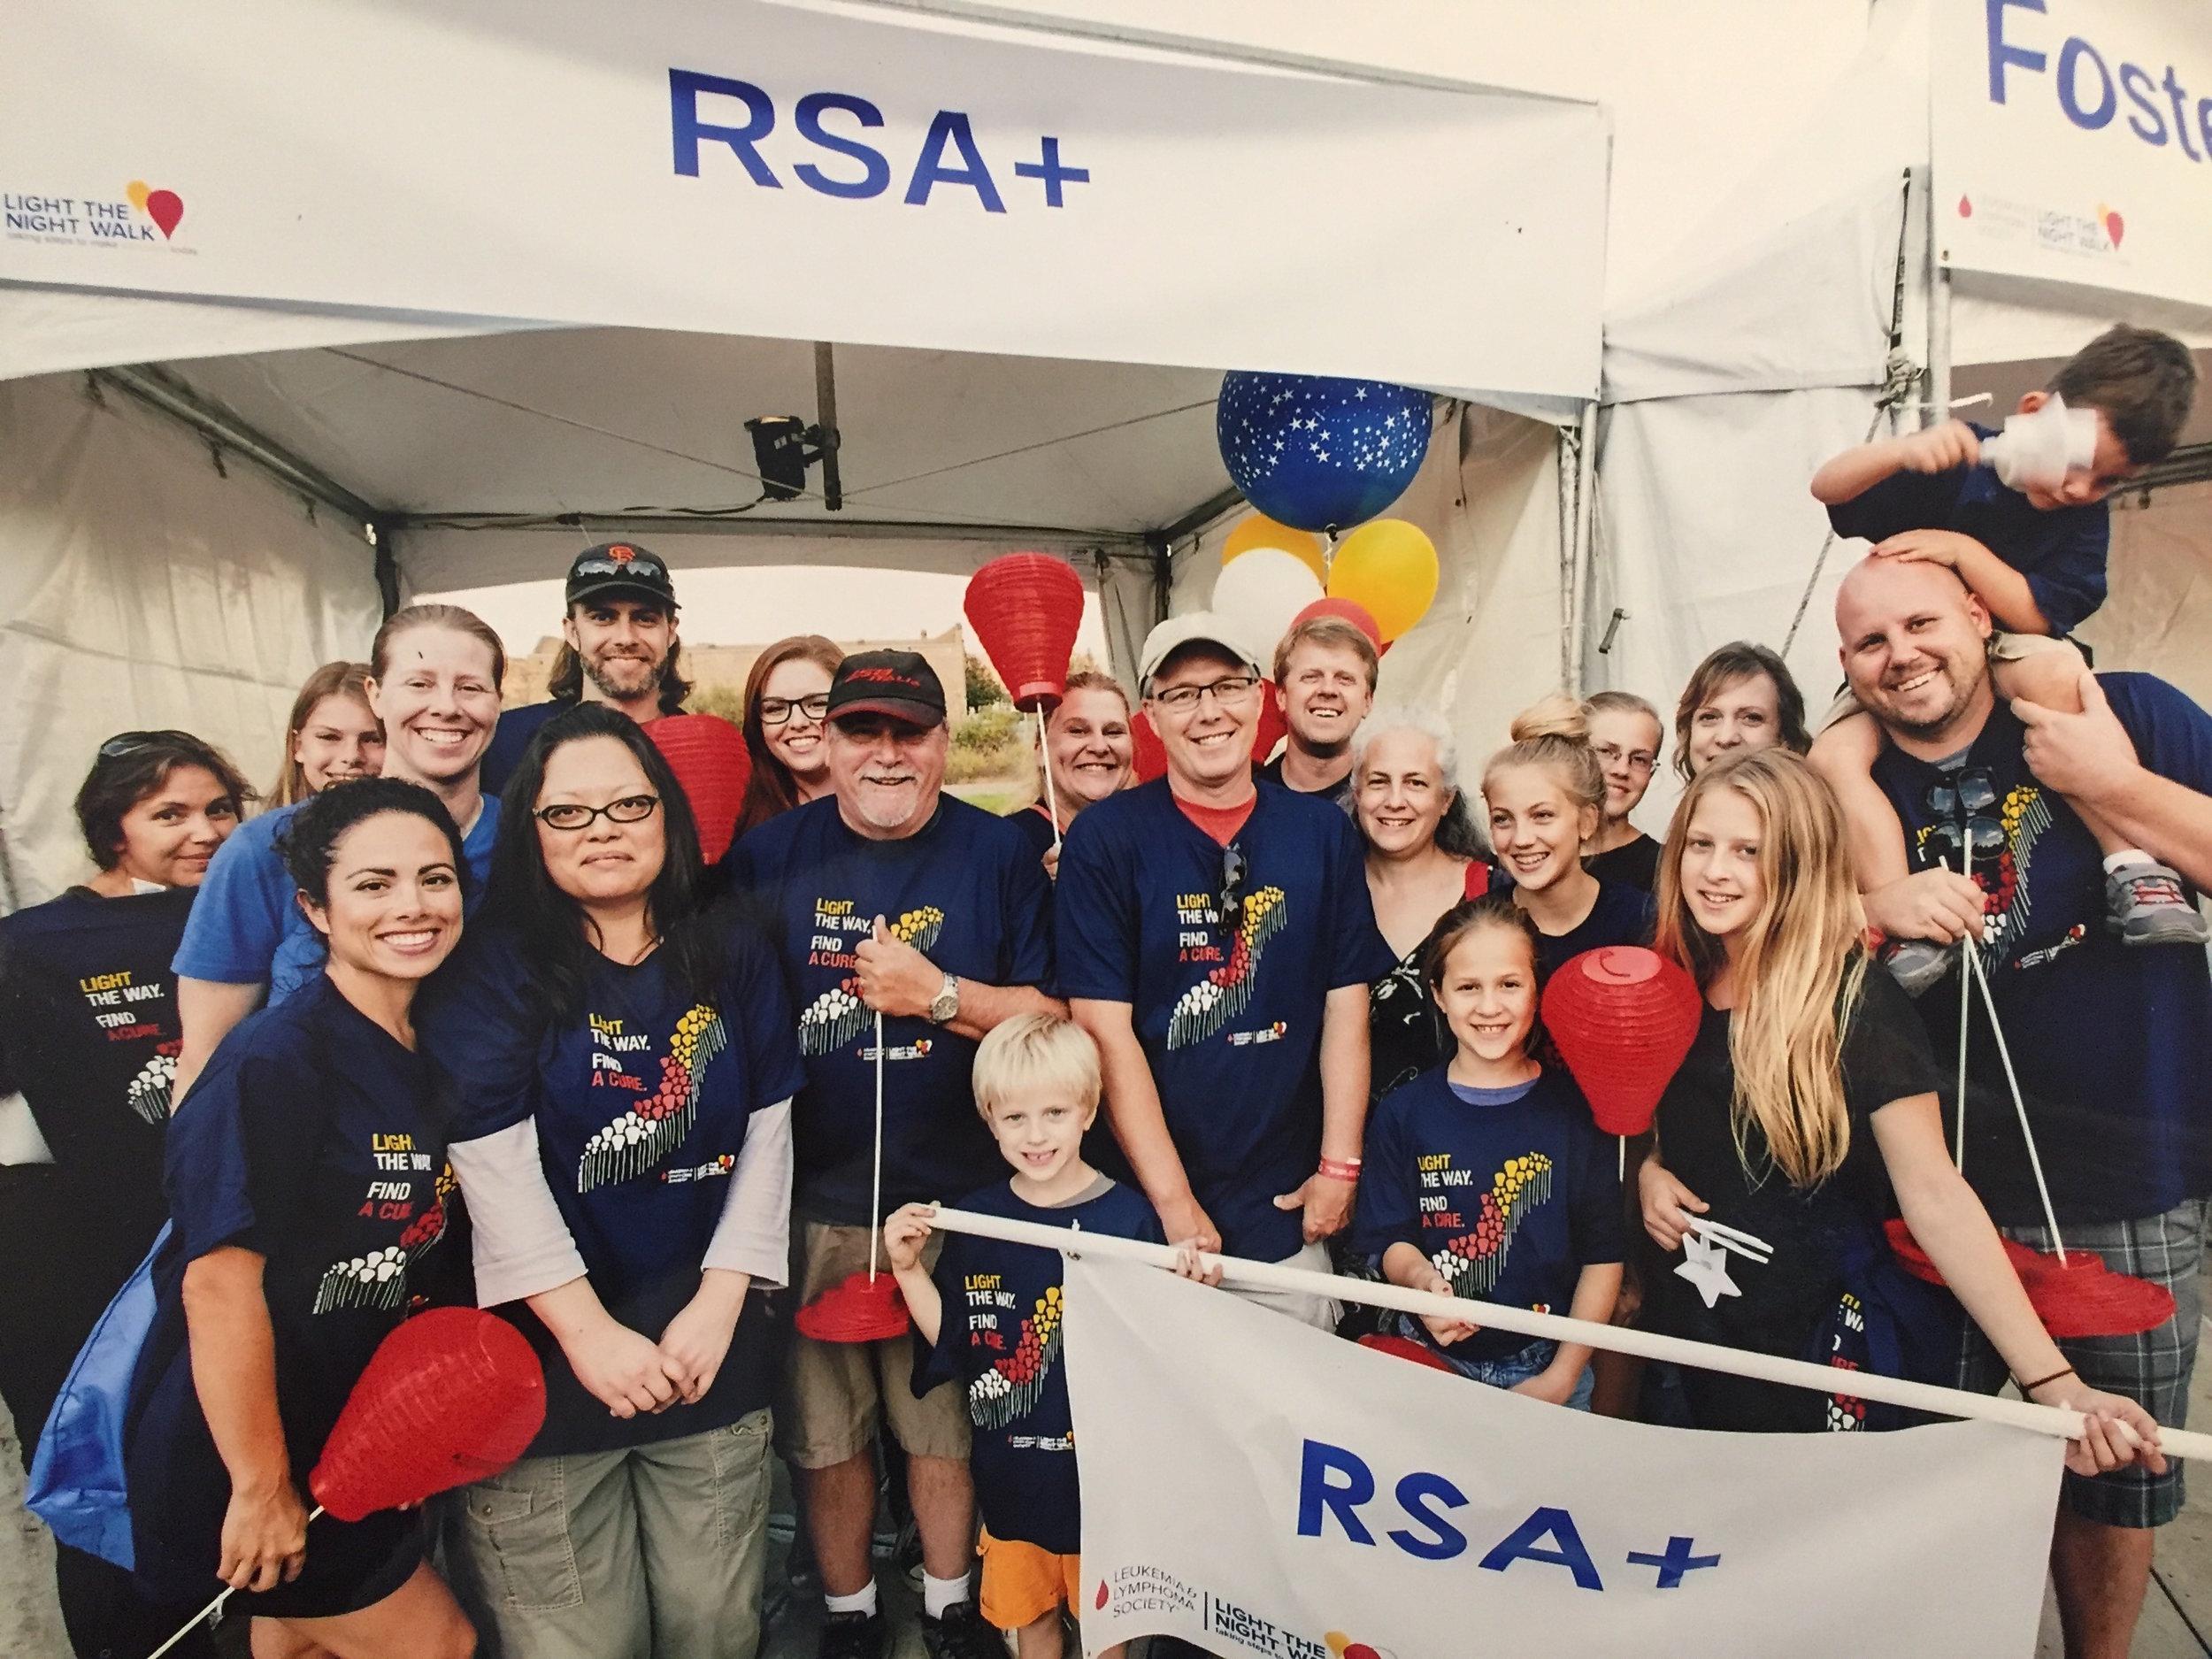 The RSA+ 2015 Light The Night team